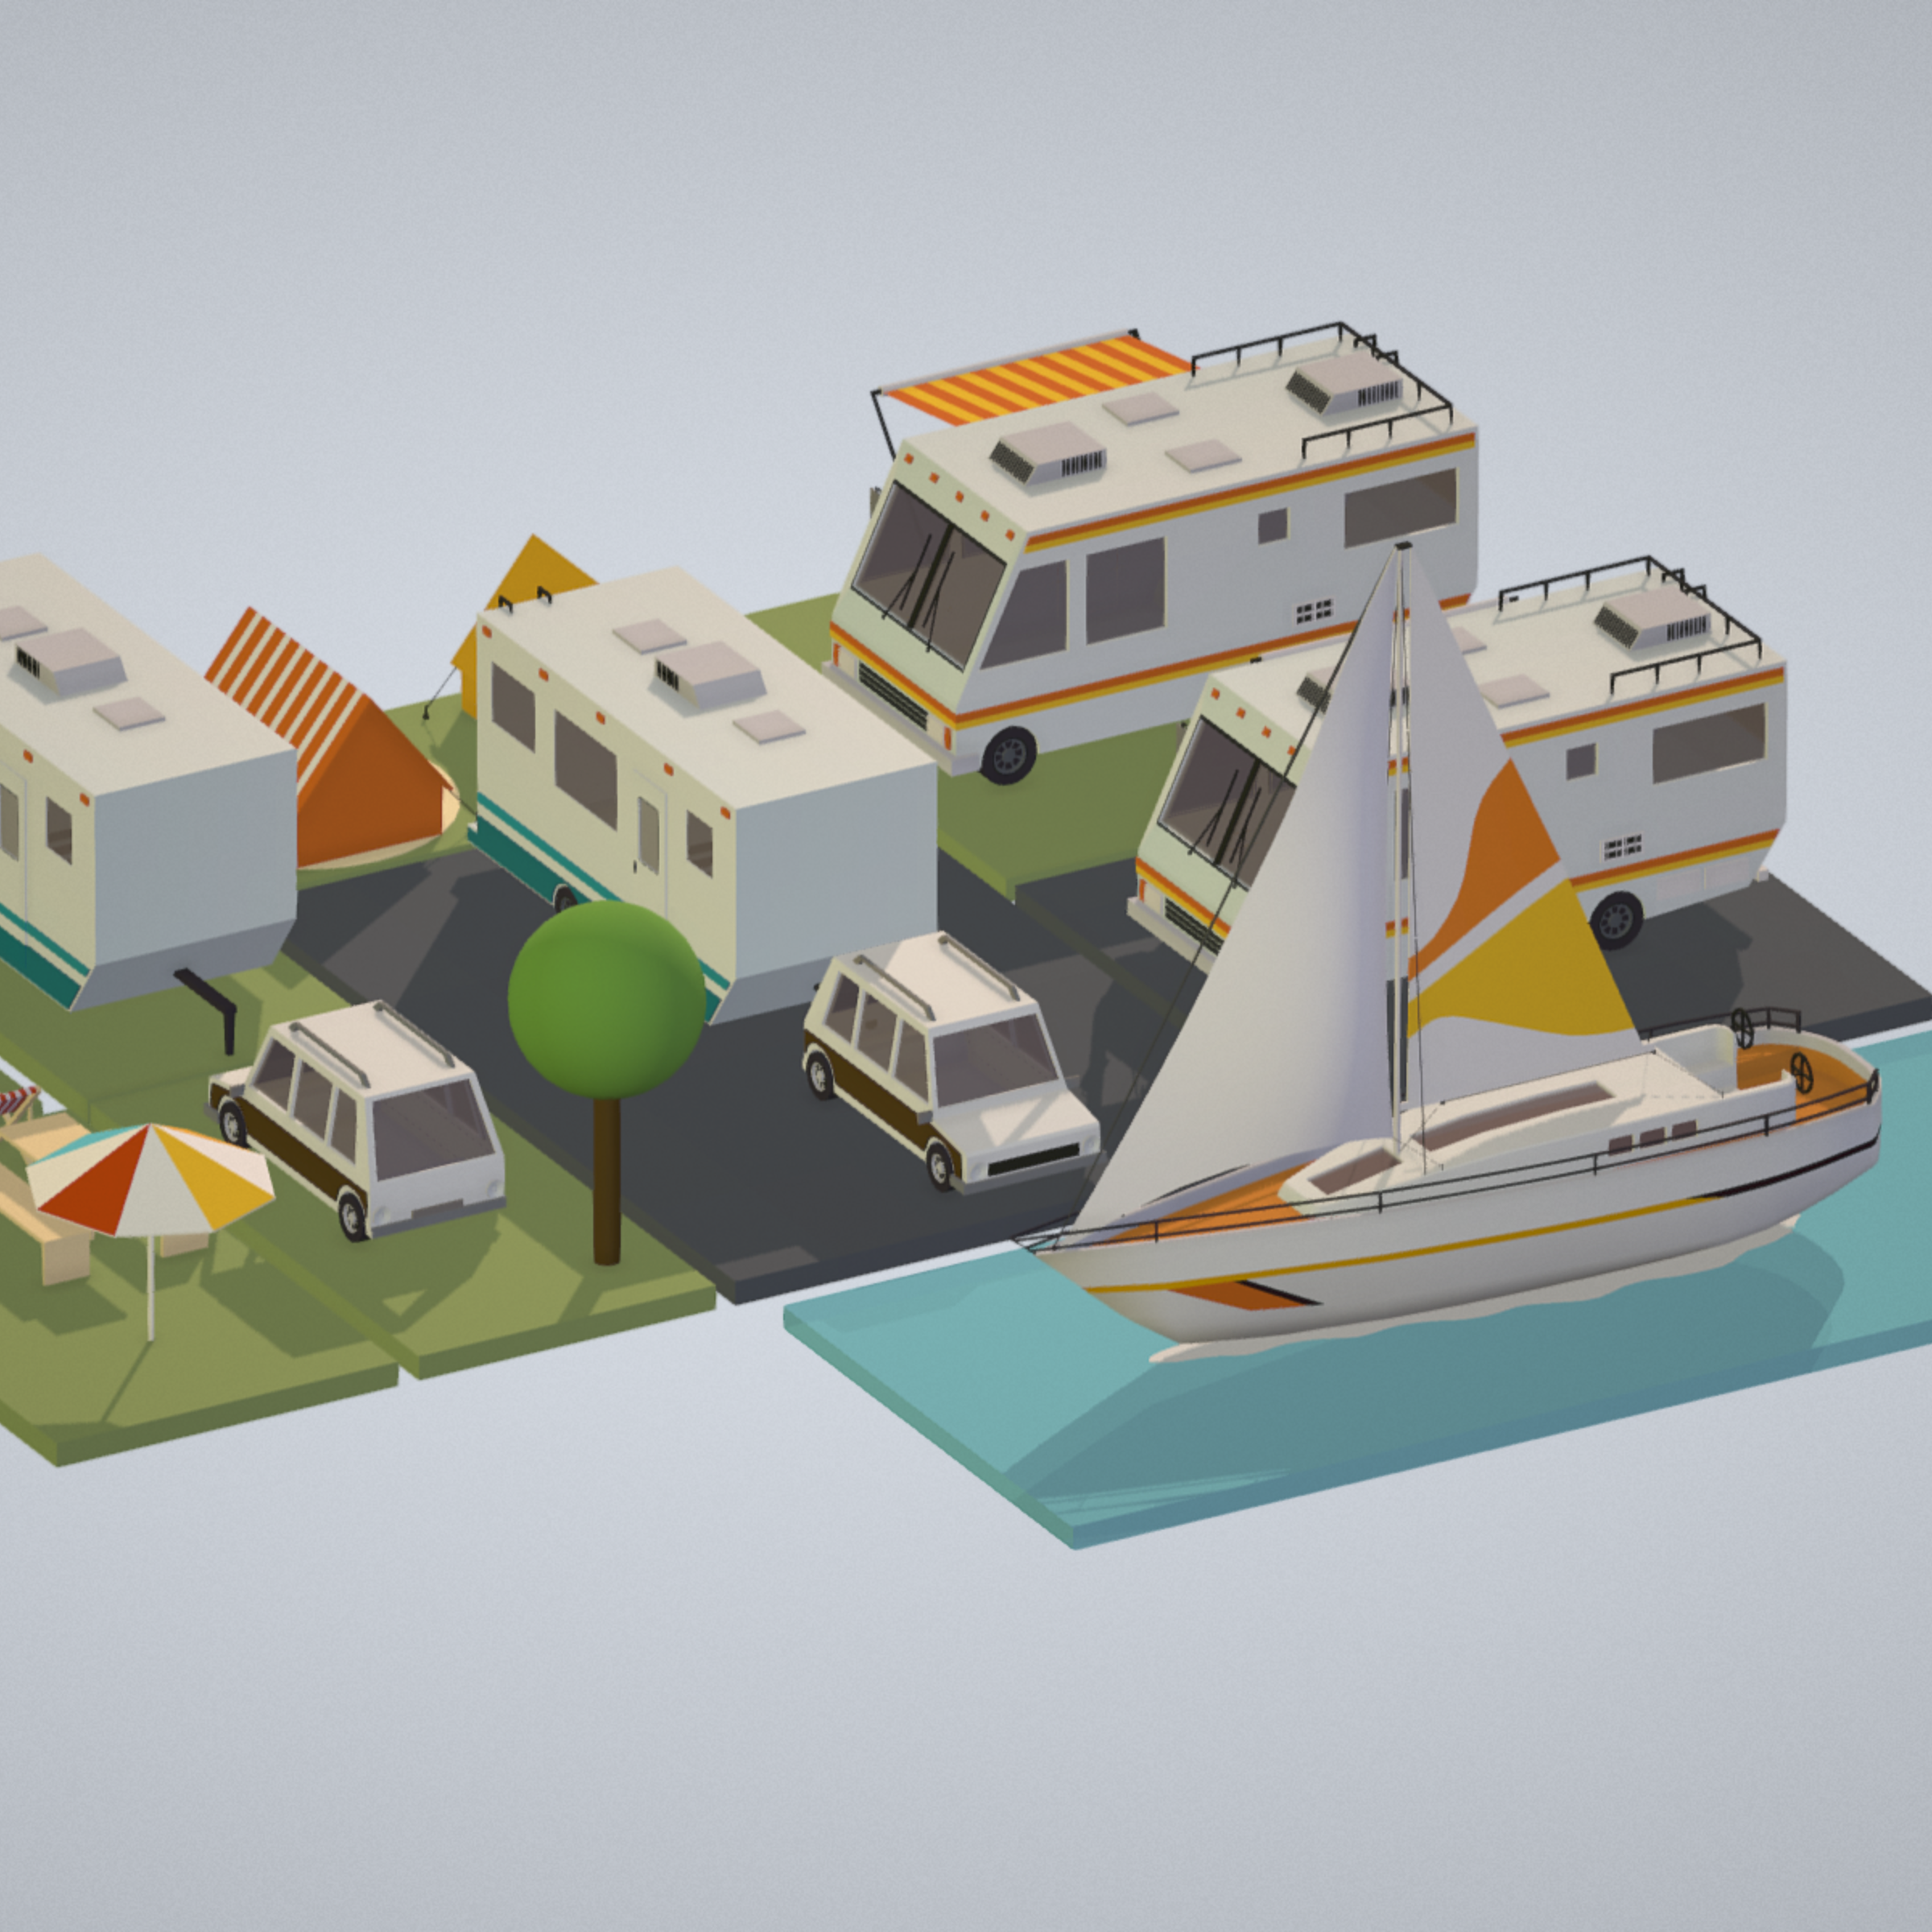 isometric transport holiday bbq camping 3d model max  fbx ma mb png obj 272009